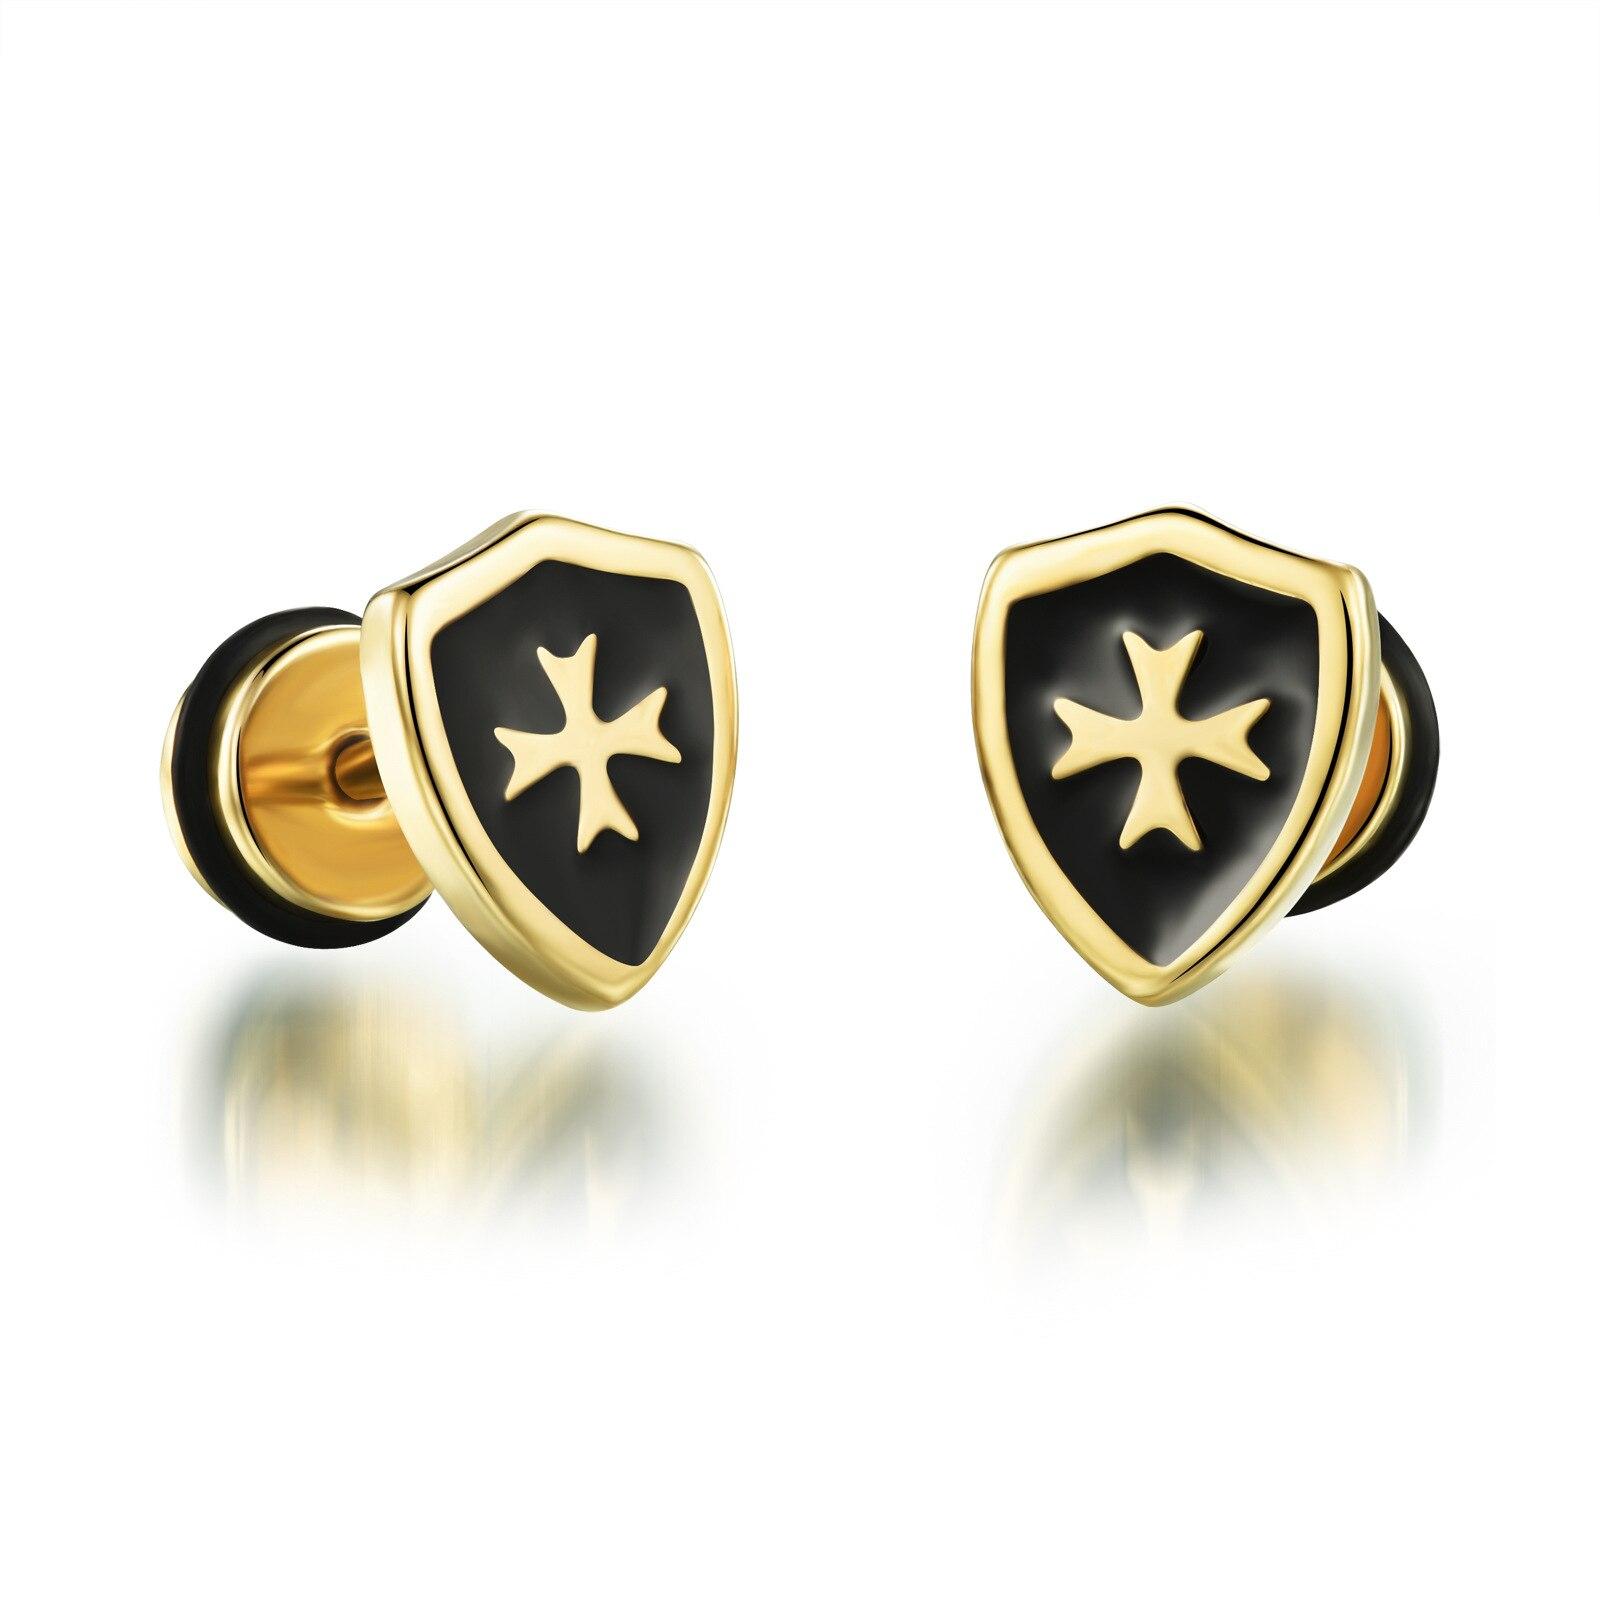 Samll Cool Man Cross Stud Earrings For Men Punk Style Gold Ptelad Stainless  Steel Earring Fashion